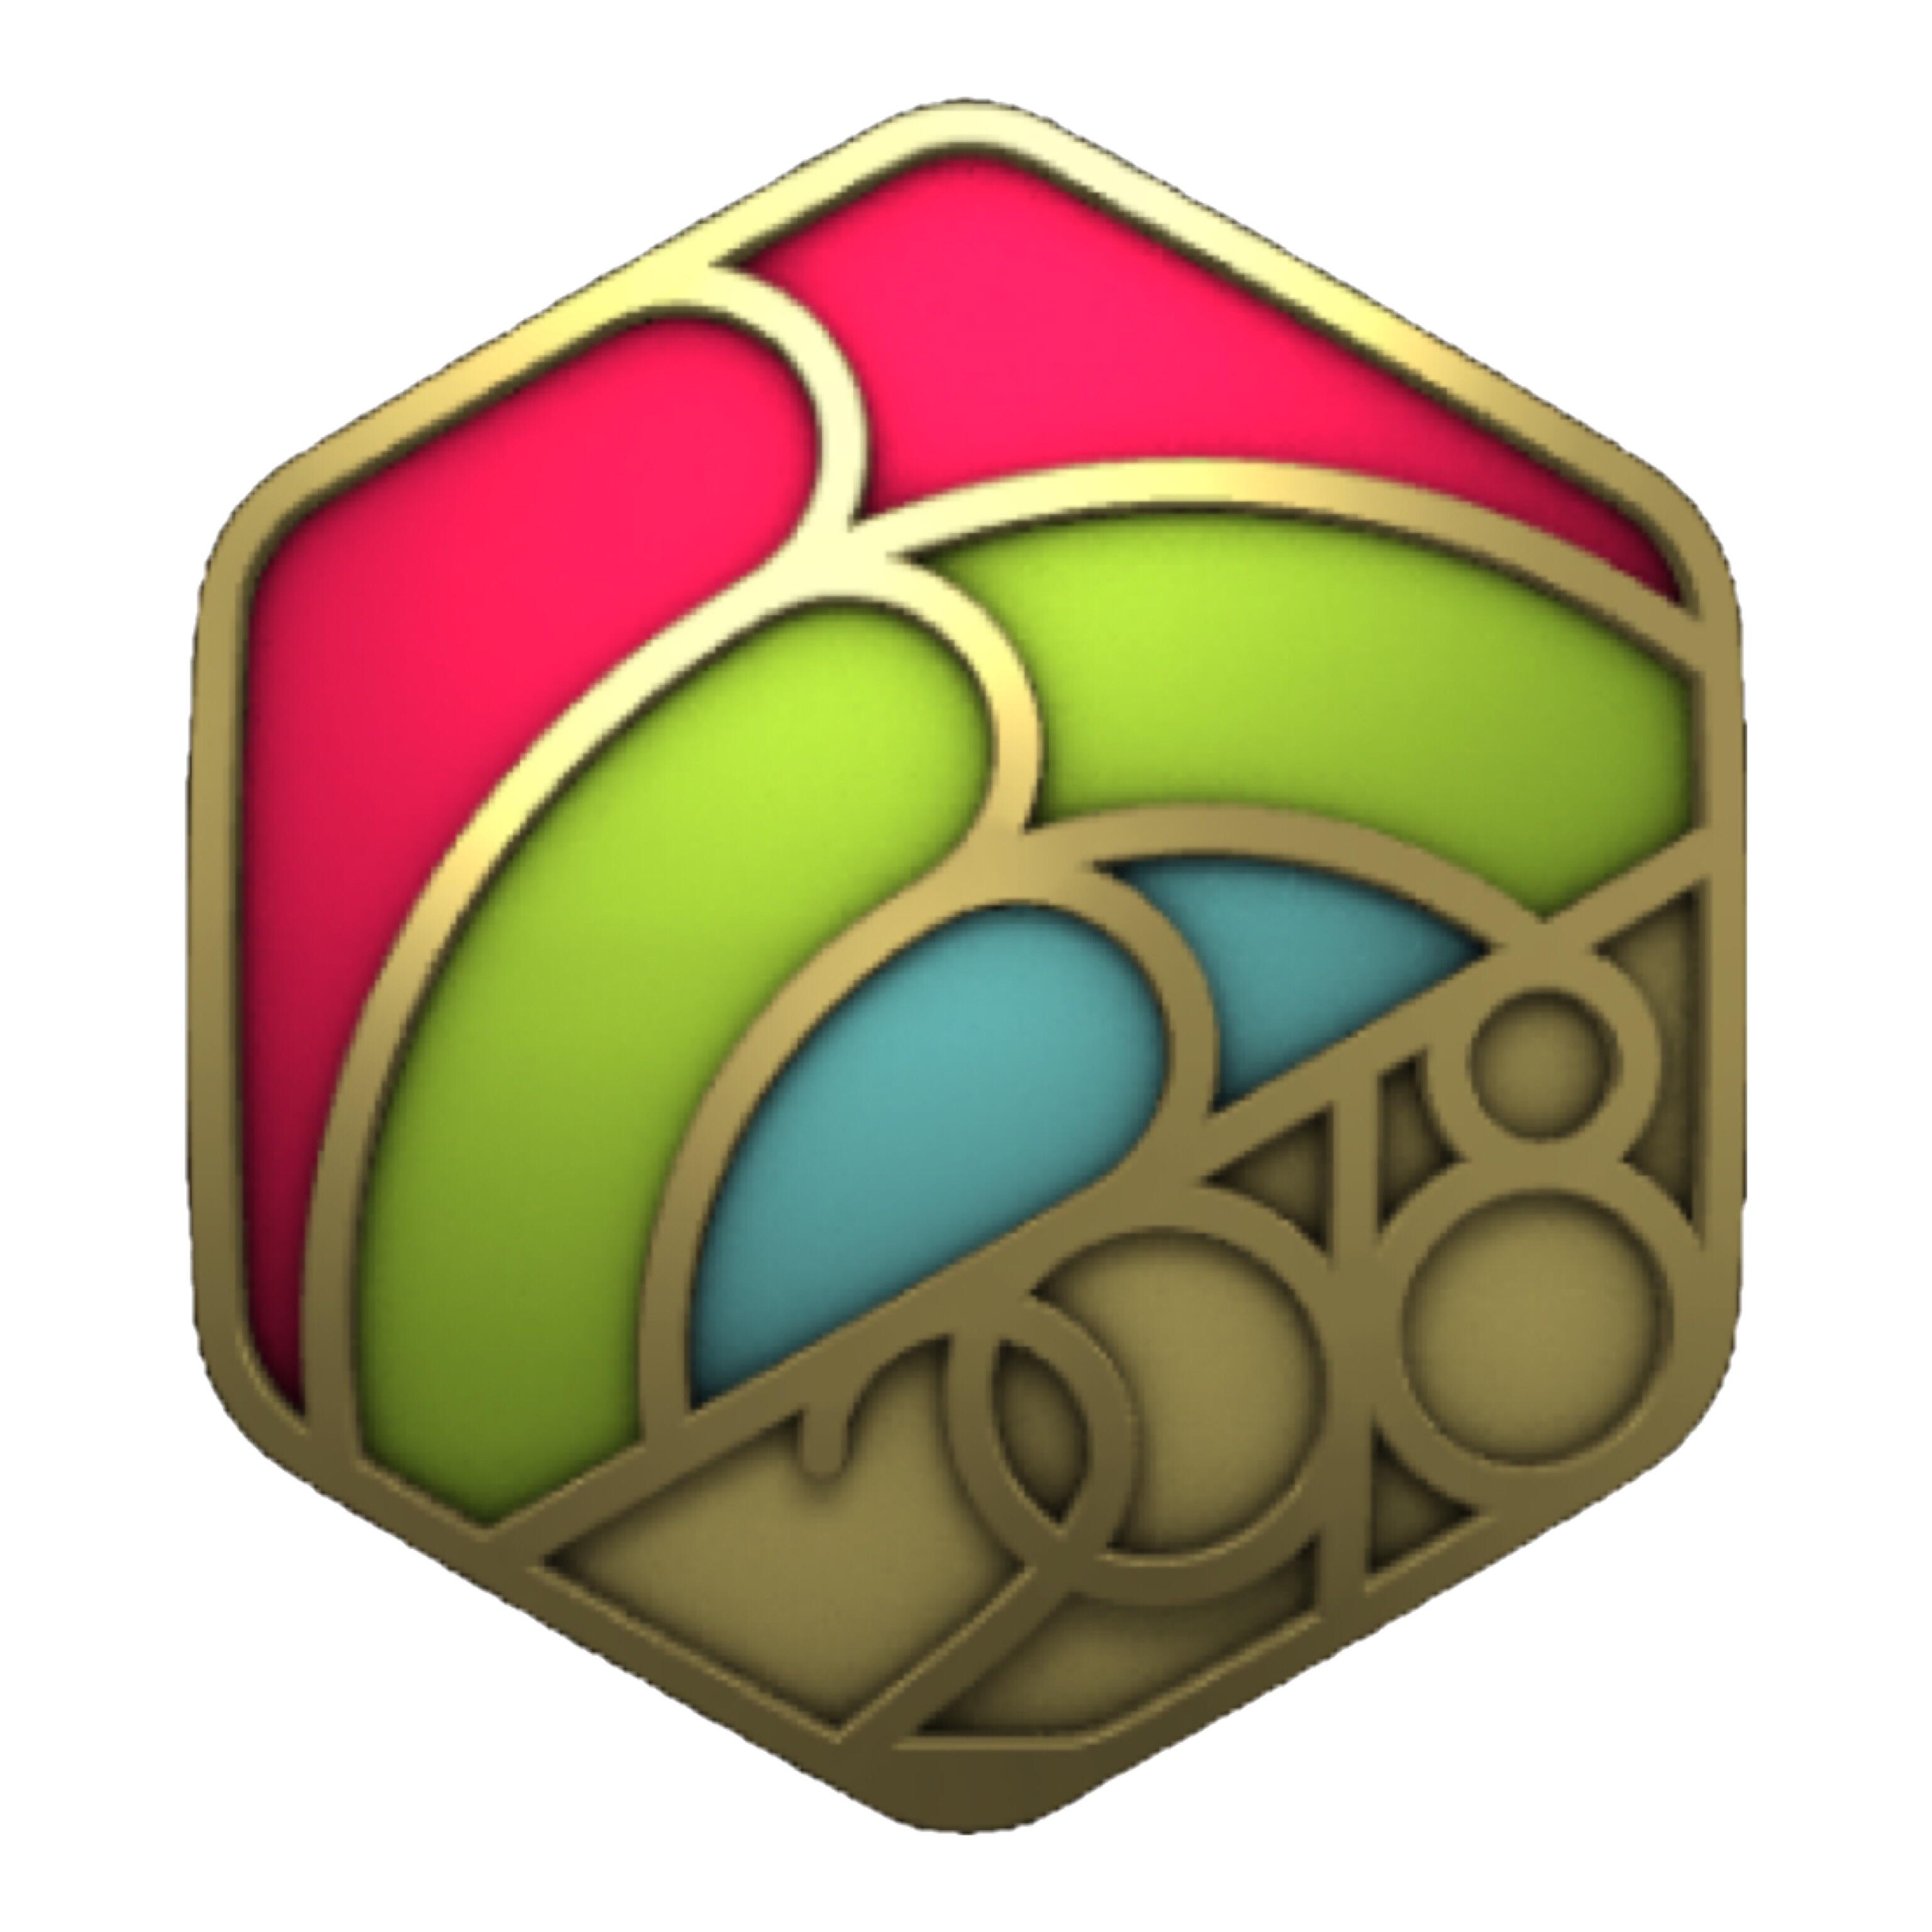 Apple Watchの「謹賀新年チャレンジ」の2018年1月版で獲得したバッジ。